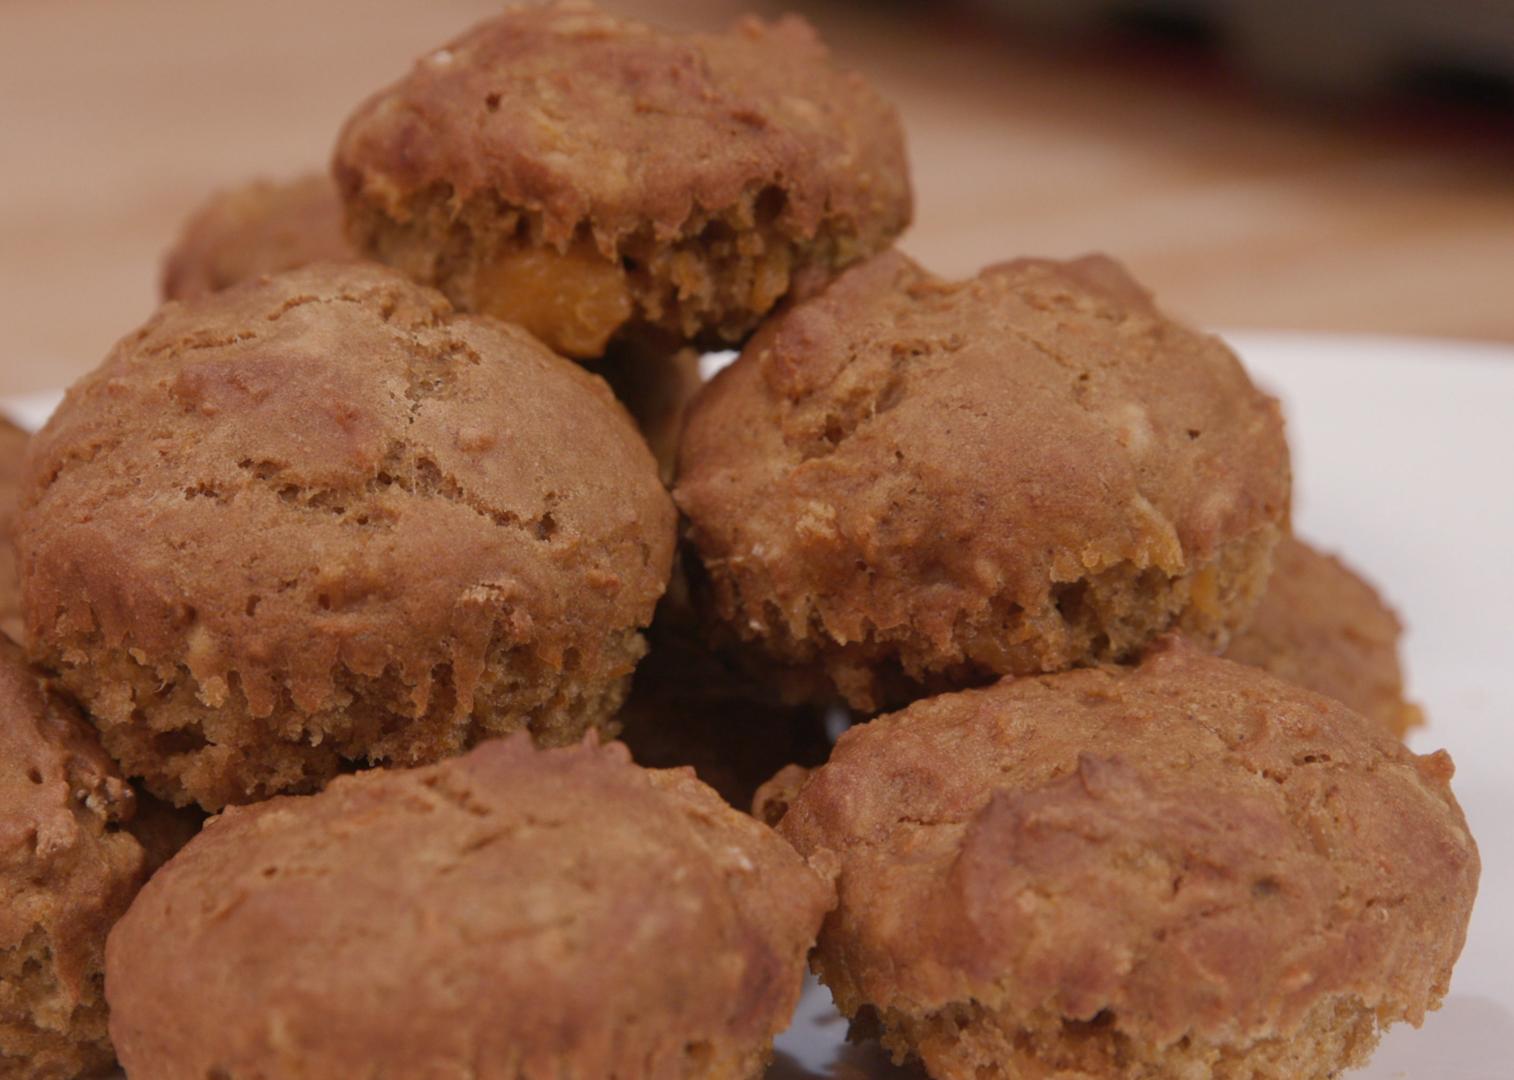 Sweet potato muffins on a white plate